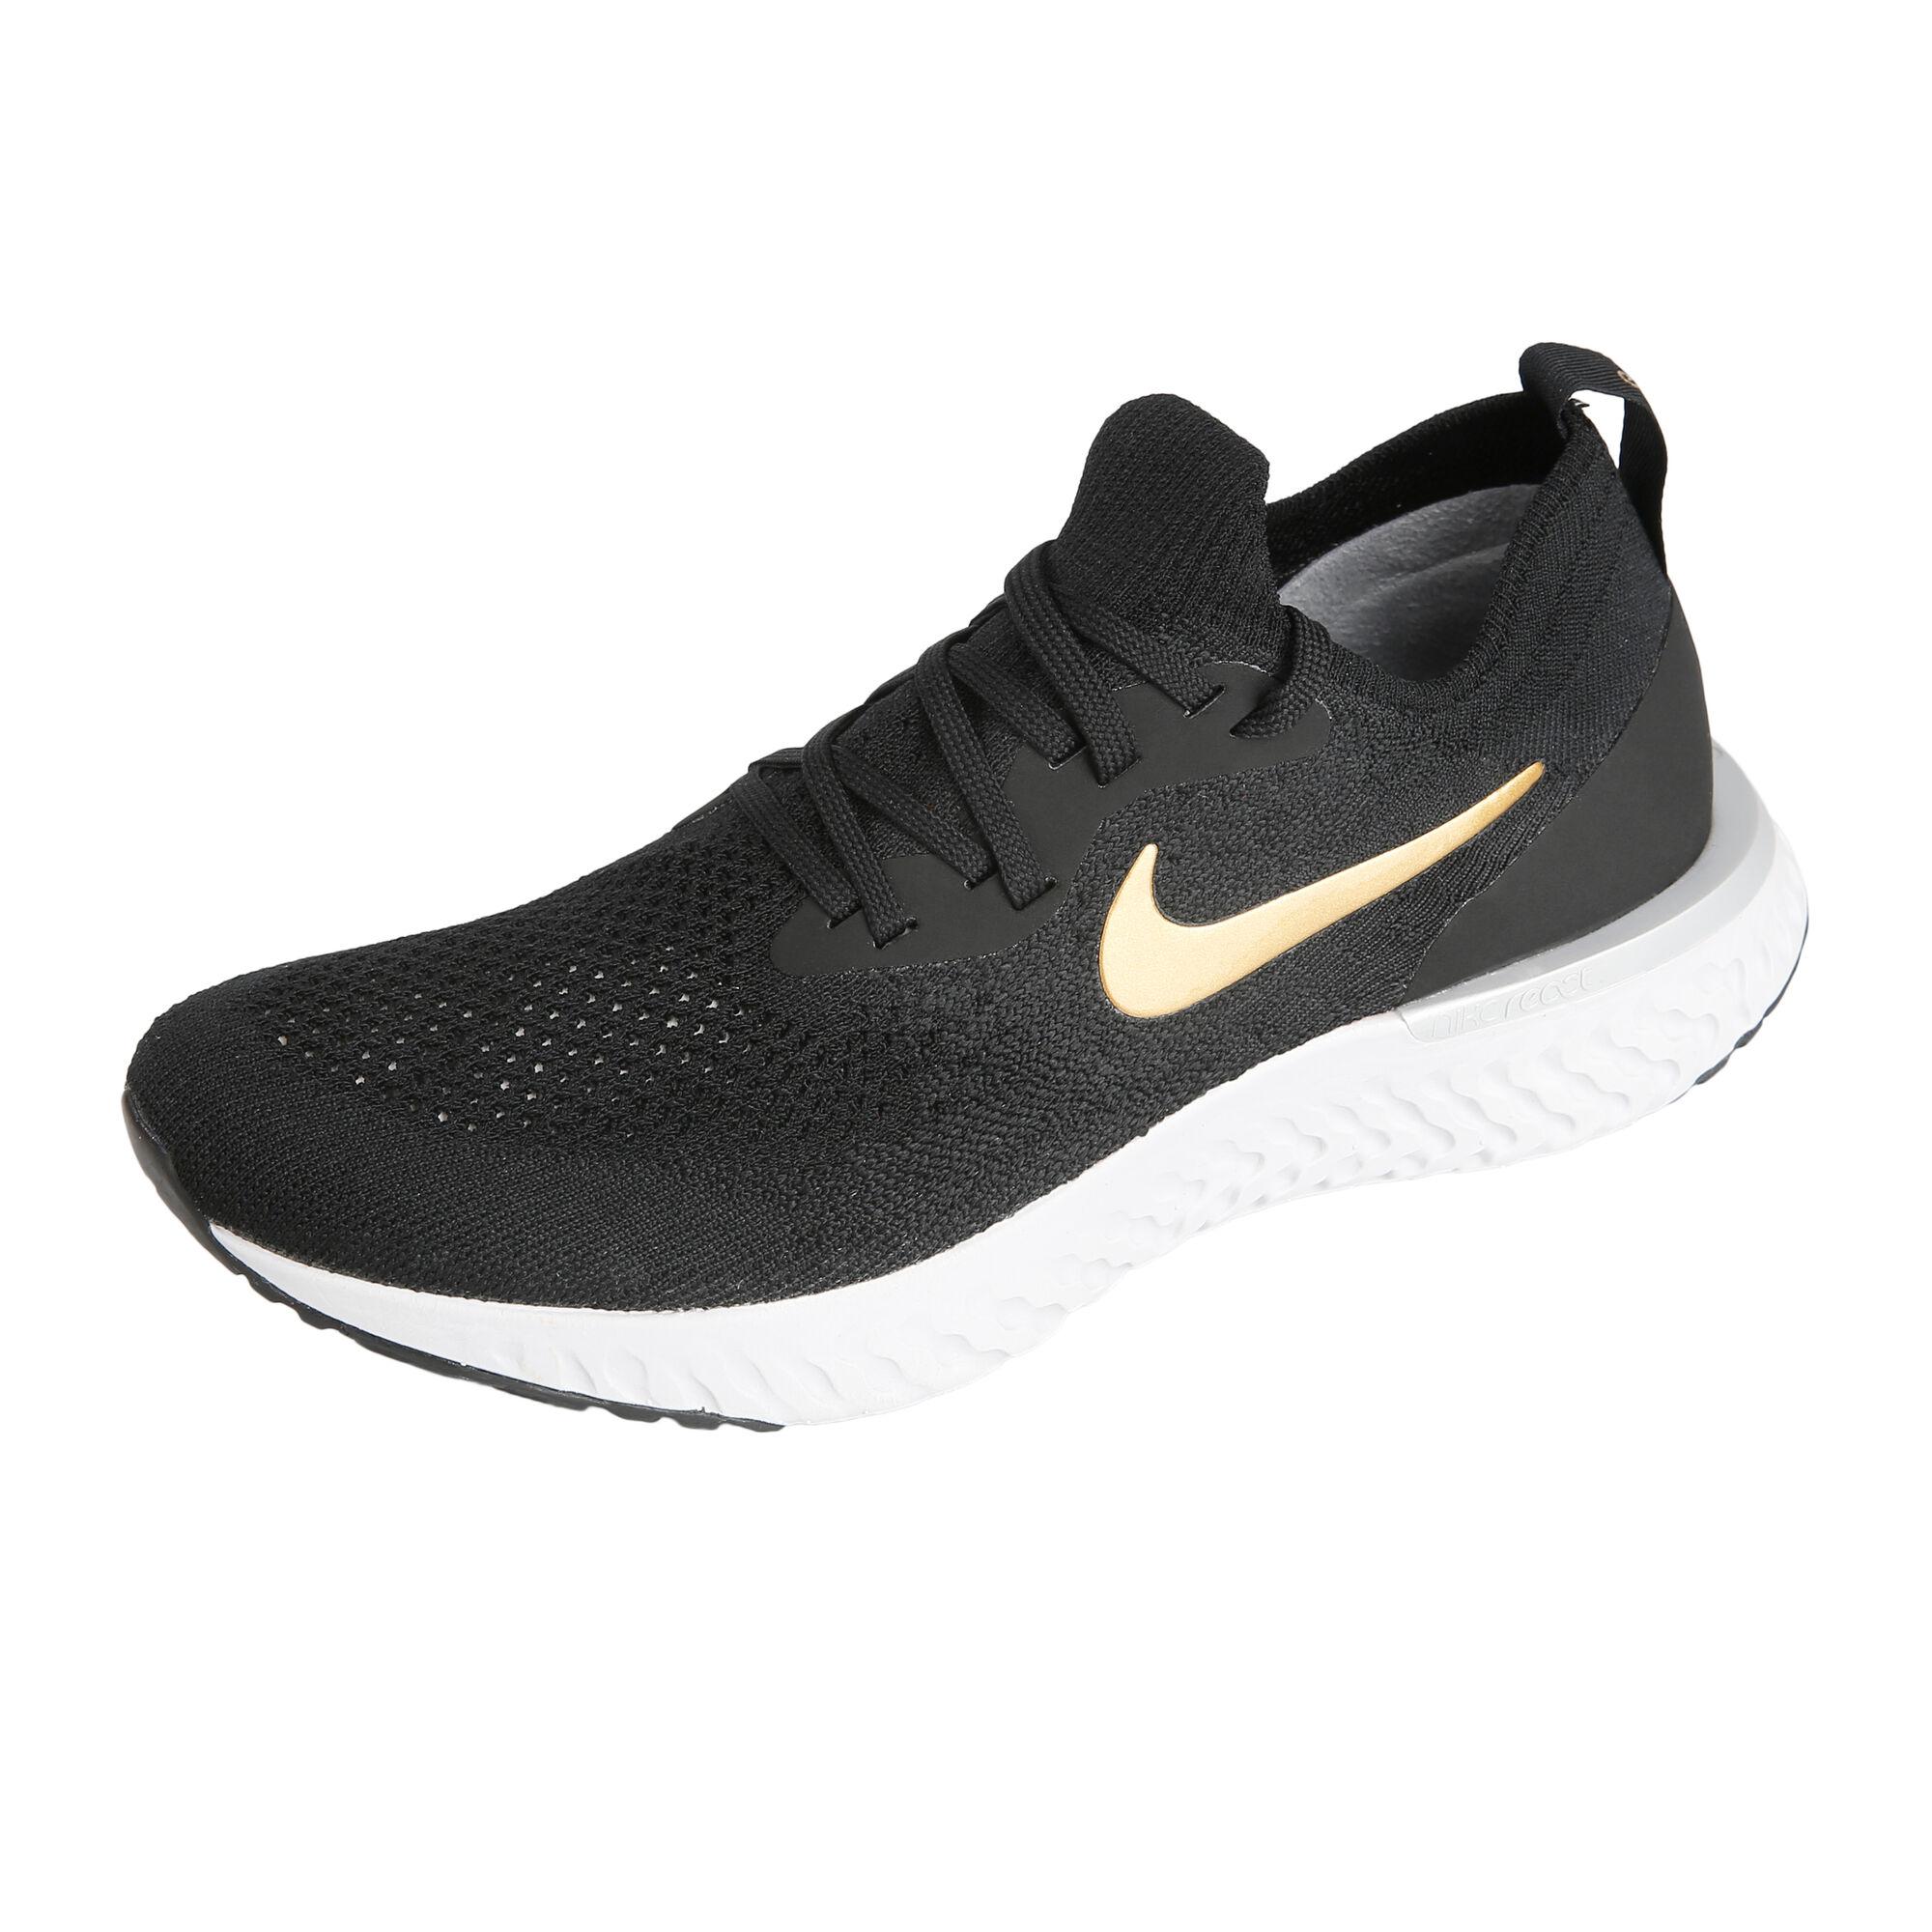 pretty nice 09bd8 10897 Nike Epic React Flyknit Neutralschuh Damen - Schwarz, Gold online ...